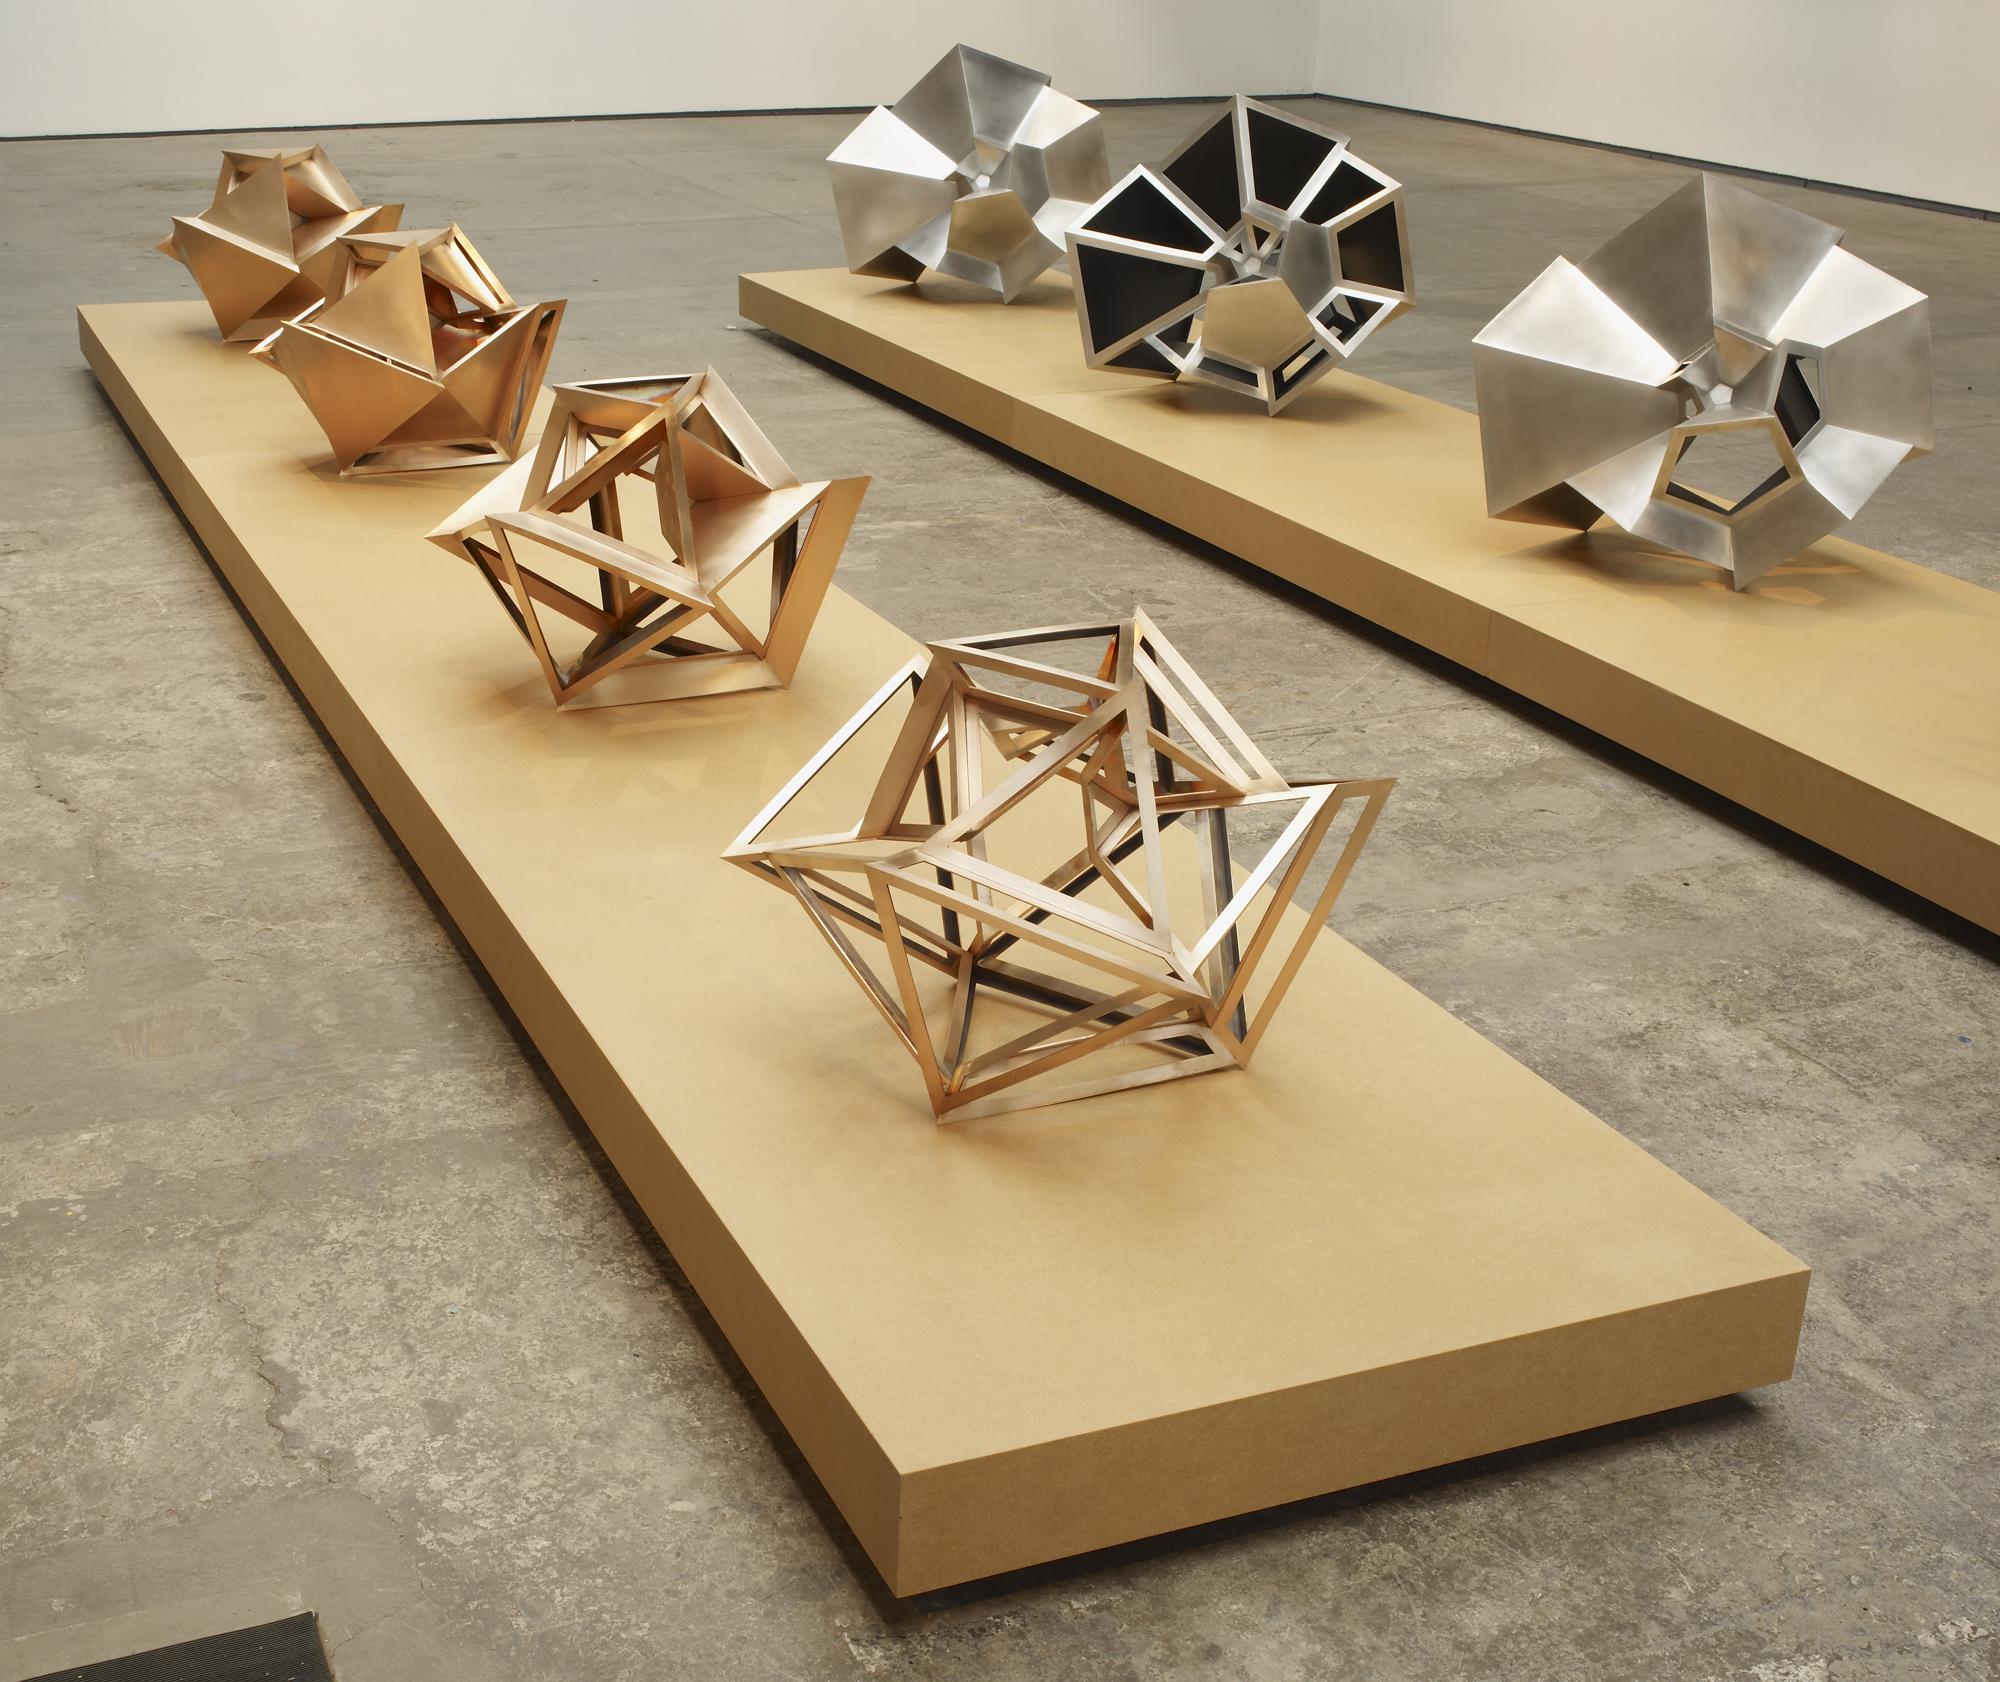 CS241_Perimeter Studies (Icosahedron) group